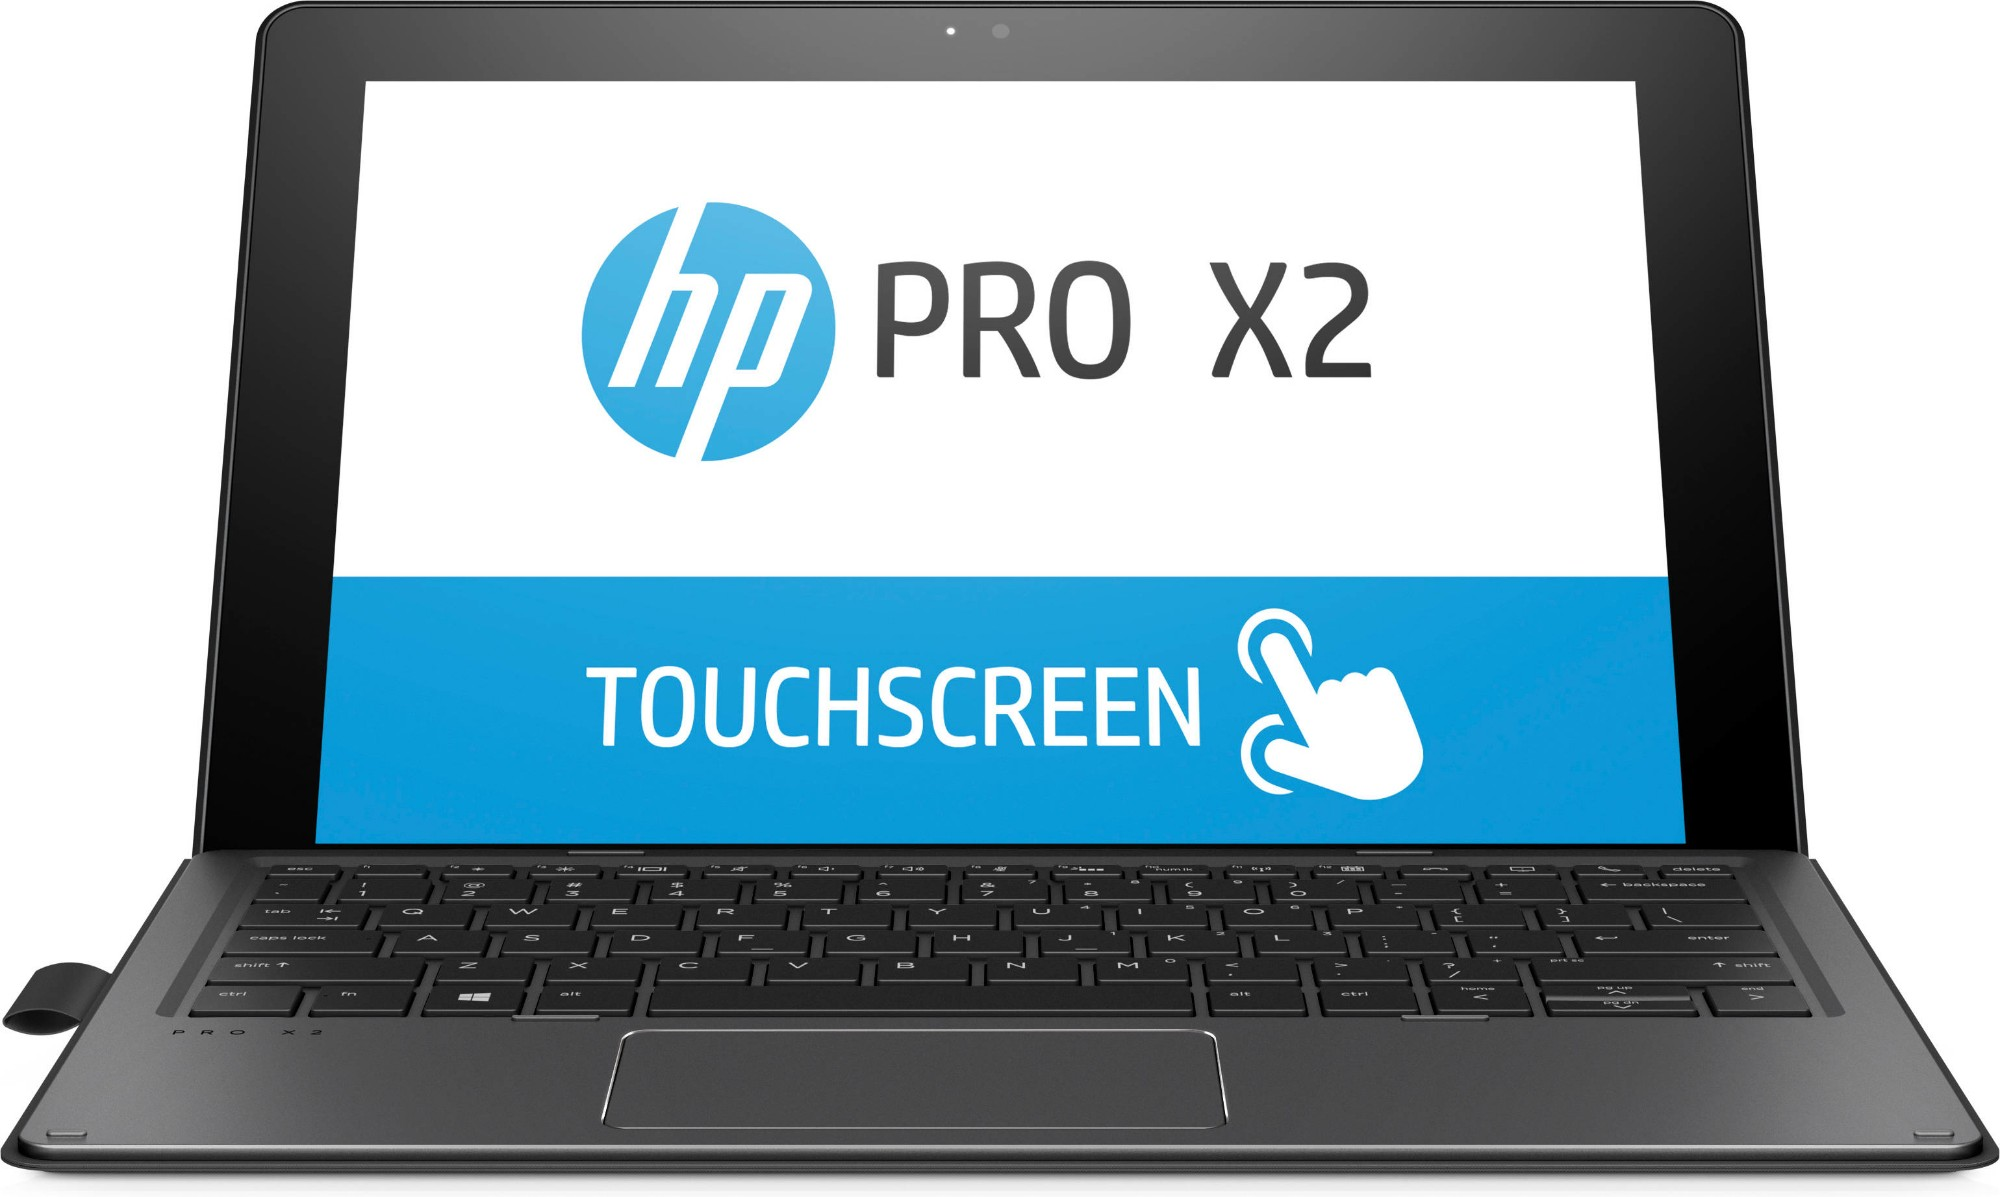 "HP Pro x2 612 G2 Black Hybrid (2-in-1) 30.5 cm (12"") 1920 x 1280 pixels Touchscreen 1.00 GHz Intel® Core™ M m3-7Y30"